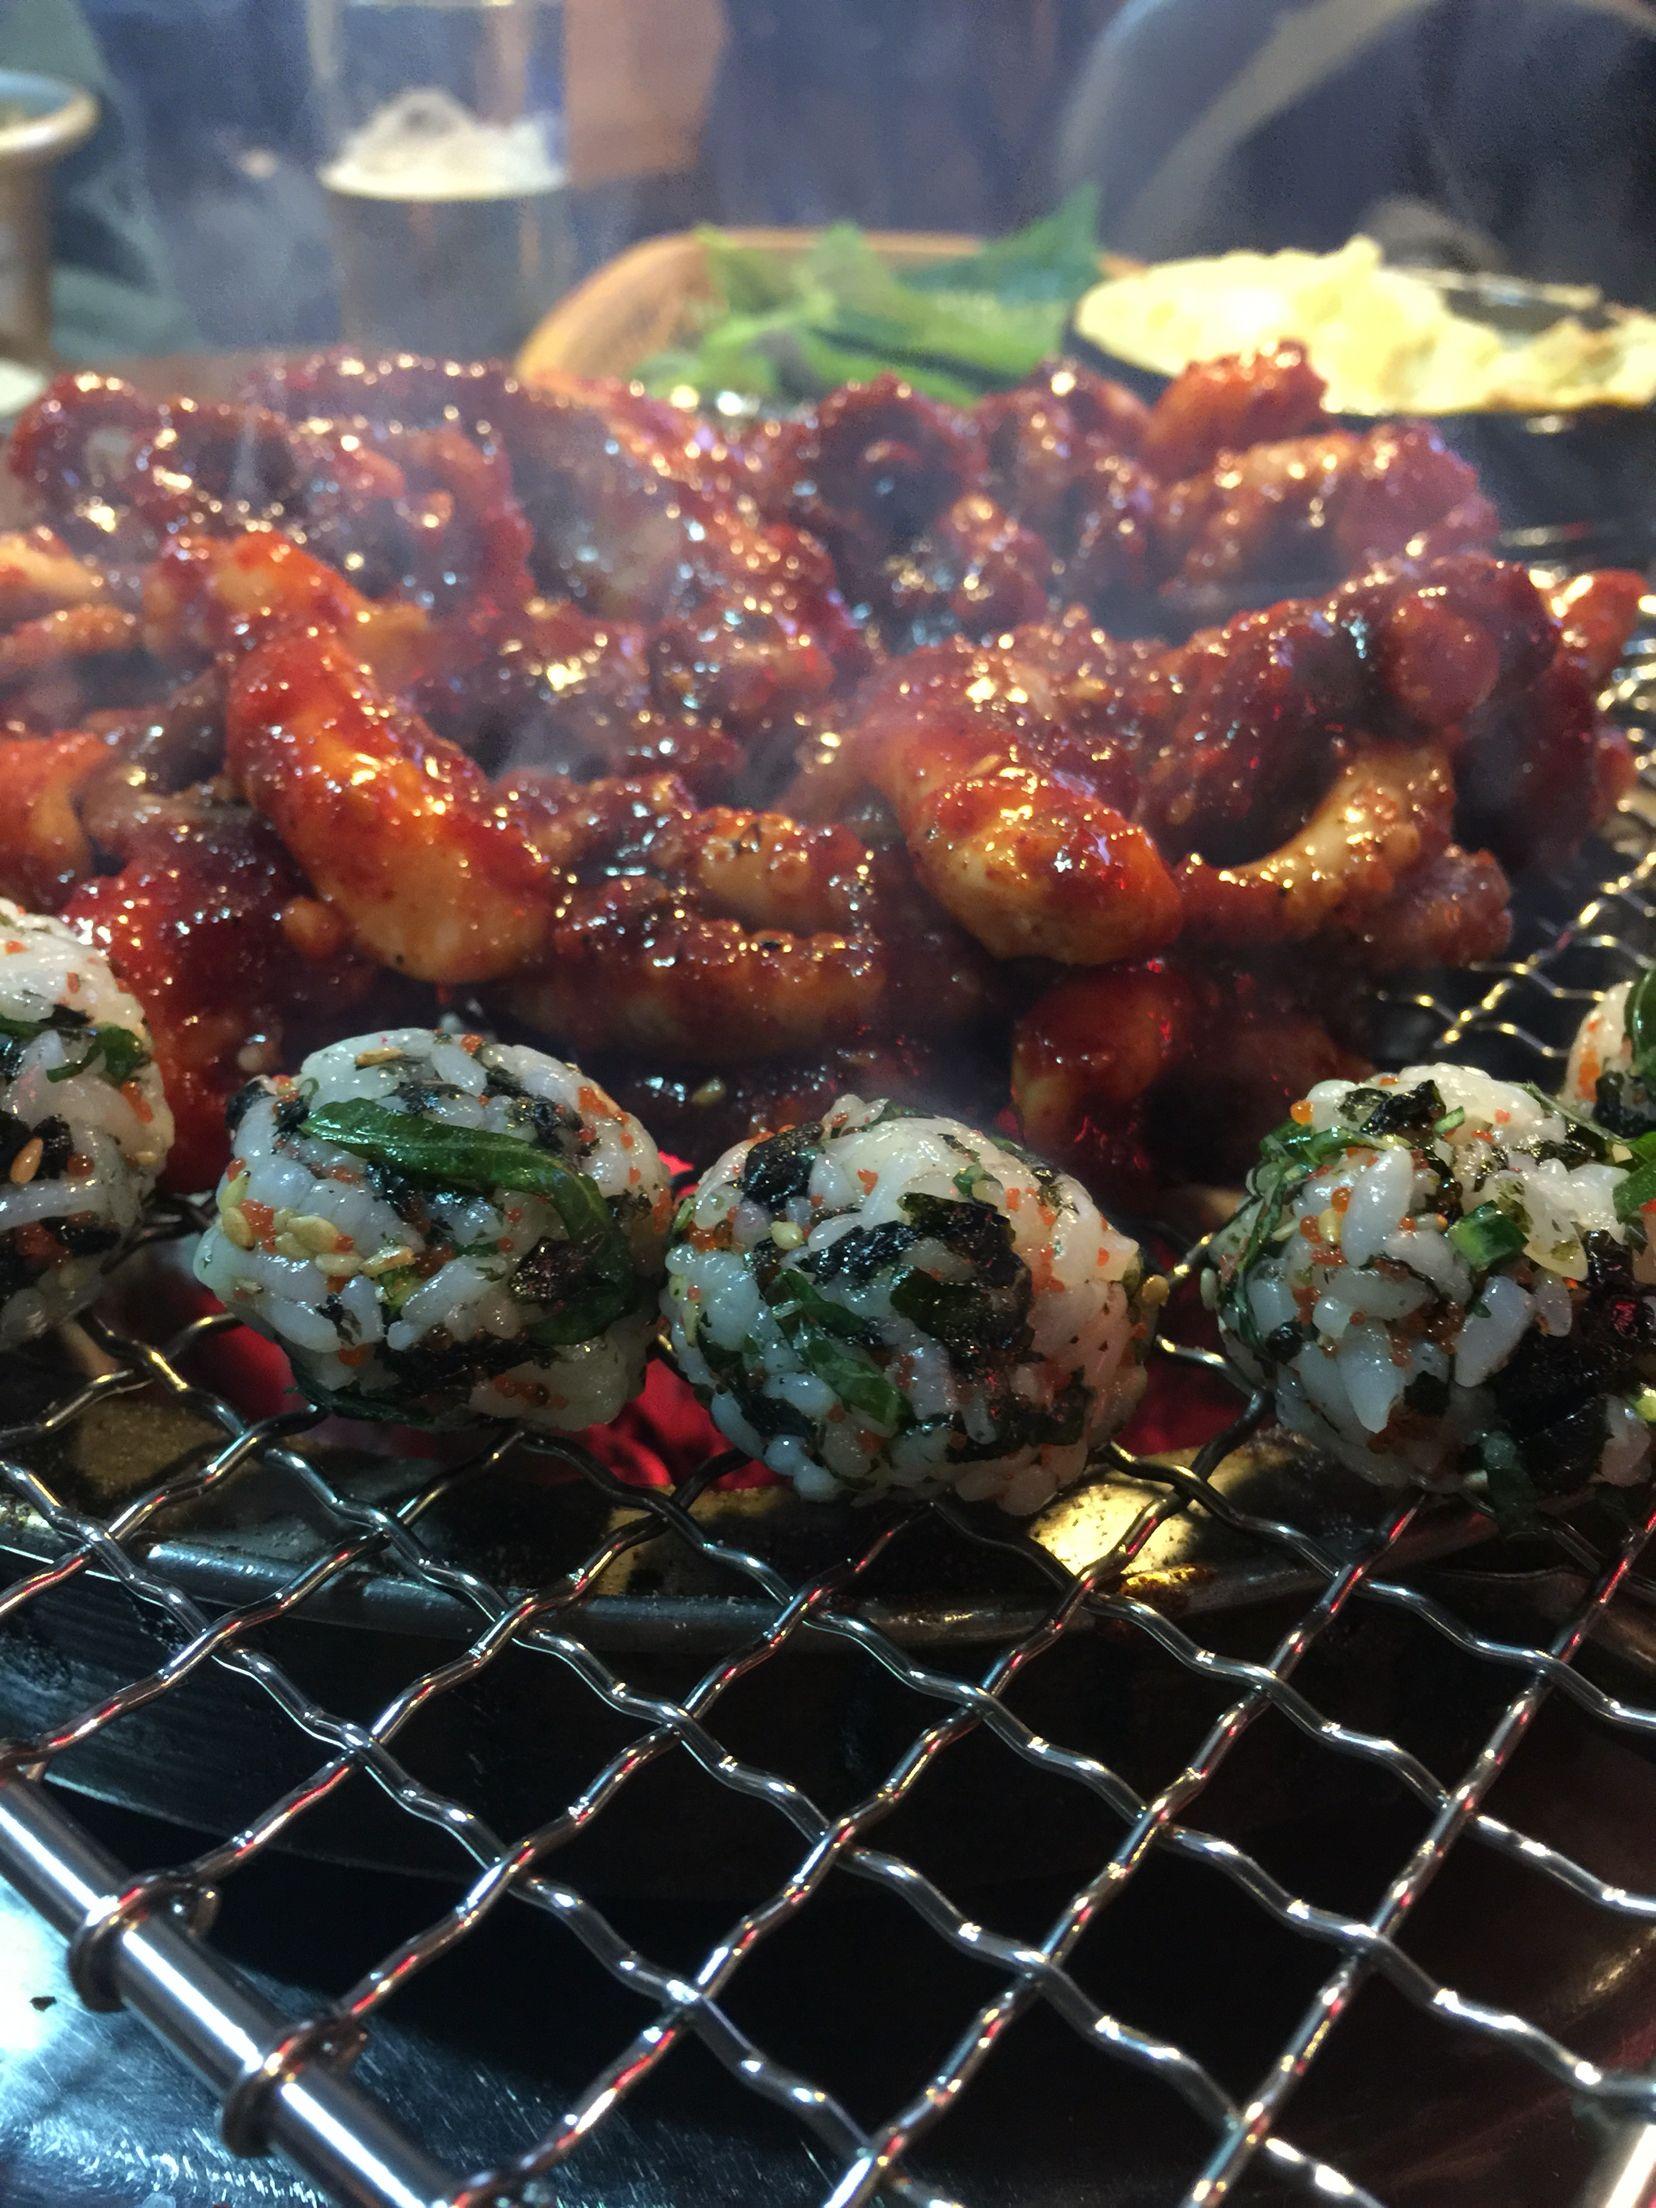 #Food #foodlover #foodoftheday #foodpic #delicious  #Instafood #Foodstagram #webfoot_octopus #yummy #먹방 #먹스타그램 #맛스타그램 #푸드스타그램 #맛집 #냠냠 #양재 #황재벌 #쭈꾸미 #알밥 이 날 배가 찢어졌다는 후문이...